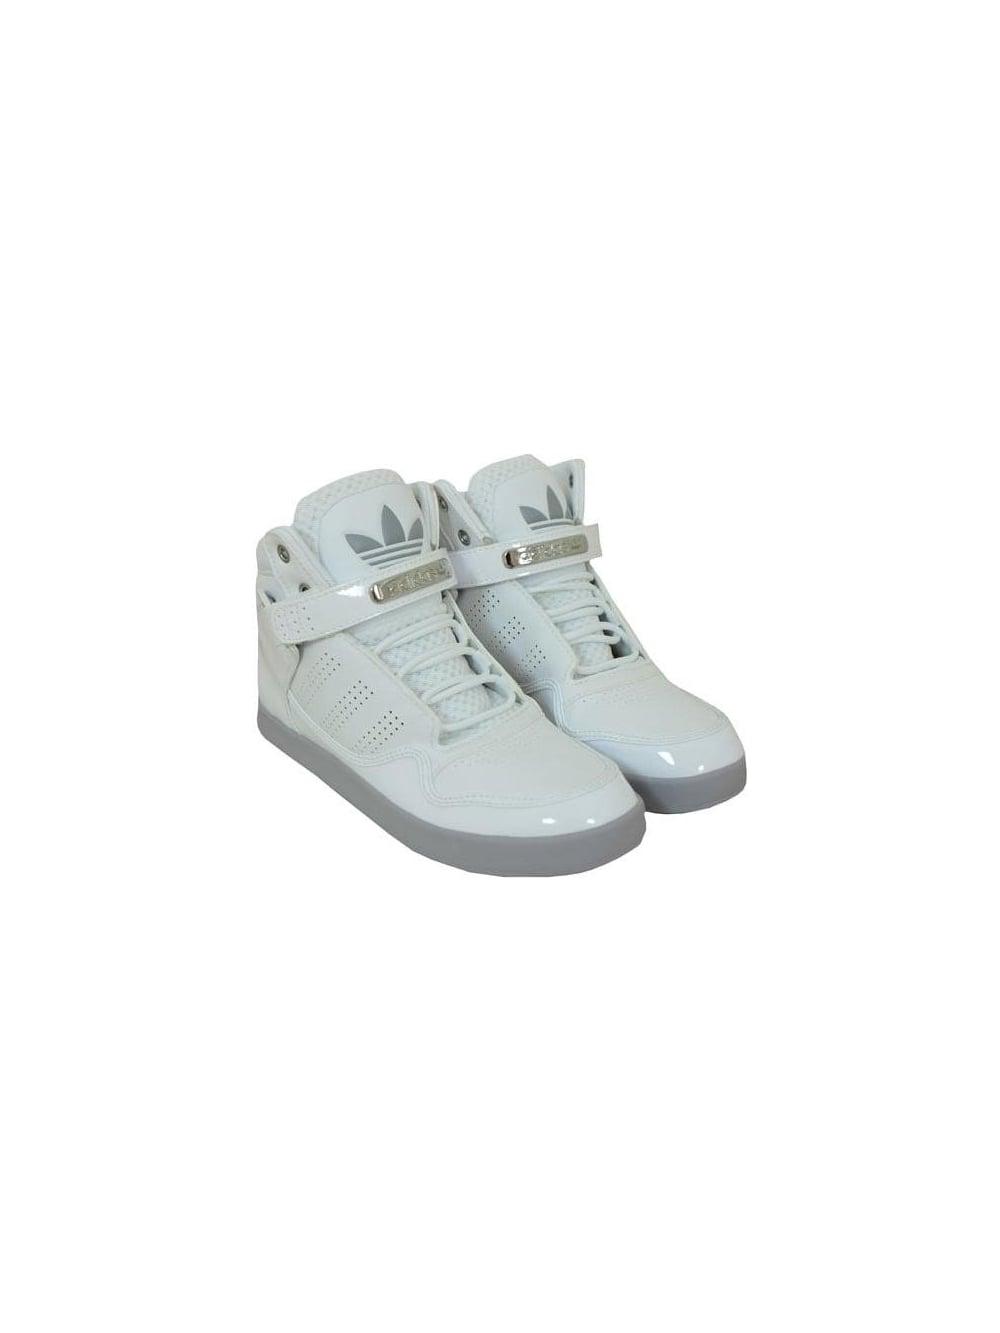 the best attitude 74cc5 98210 AR 2.0 Trainer - Running White